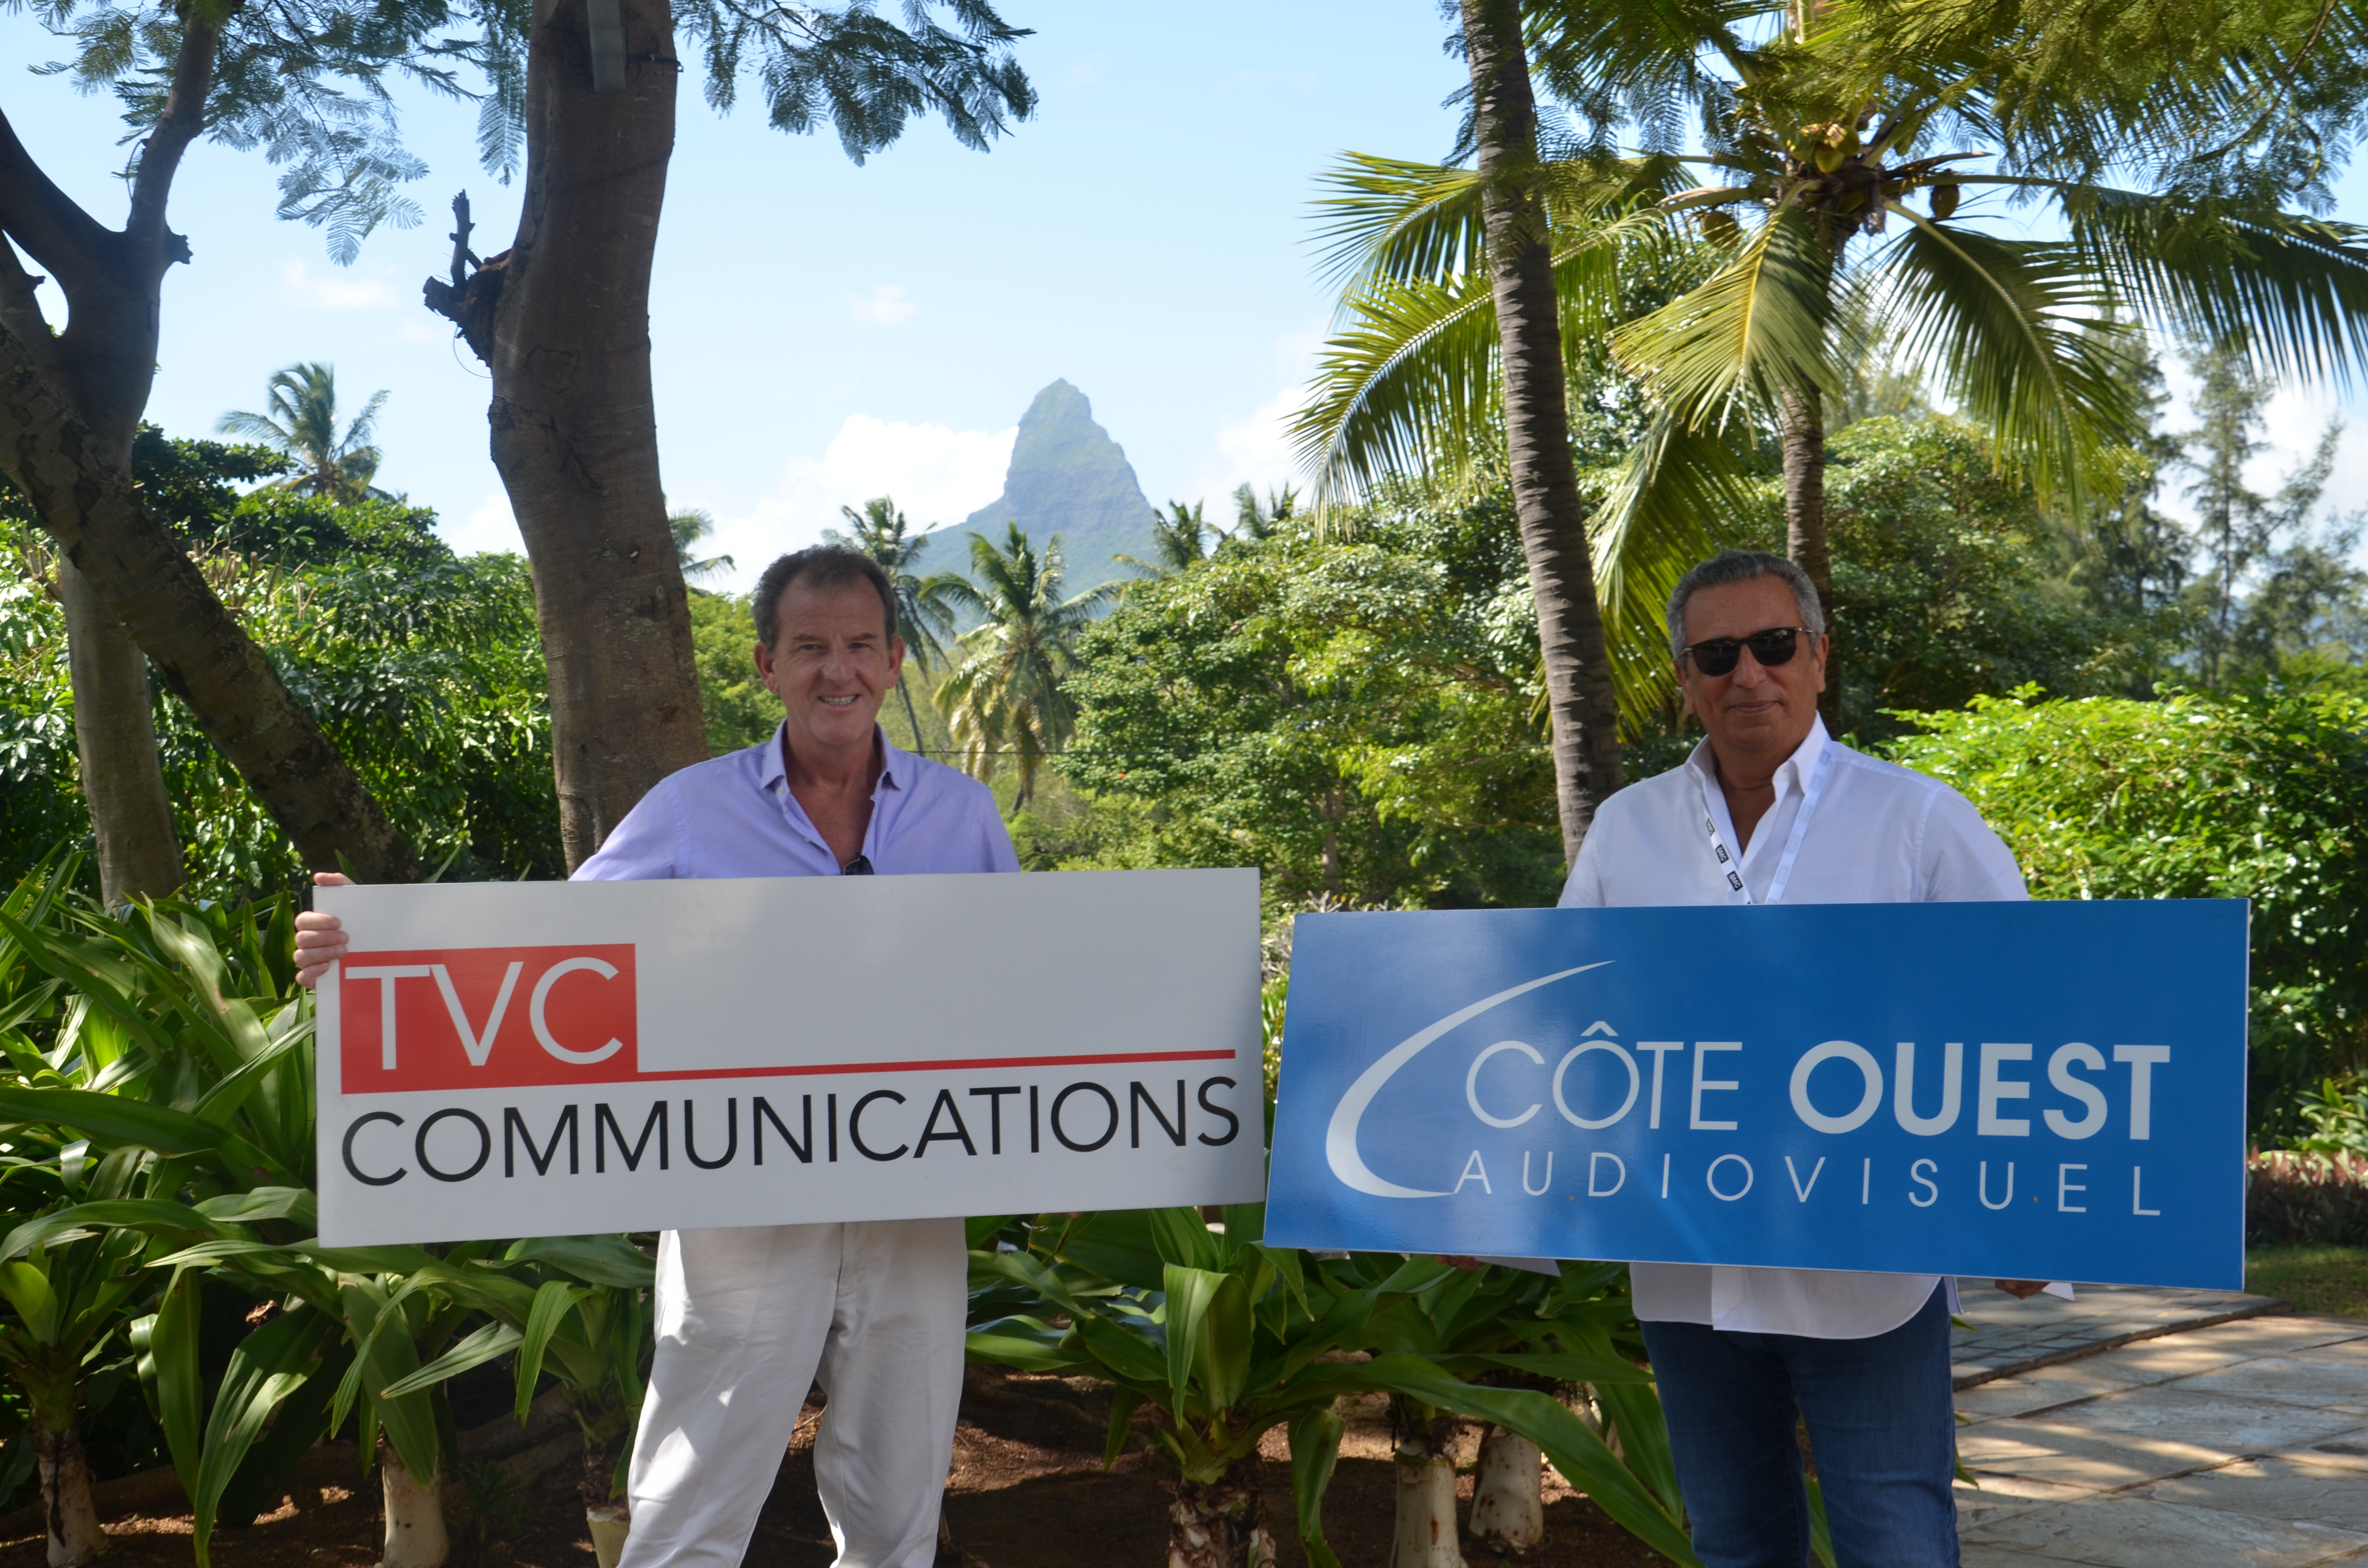 Award Winning Drama Comes to TVC Communications